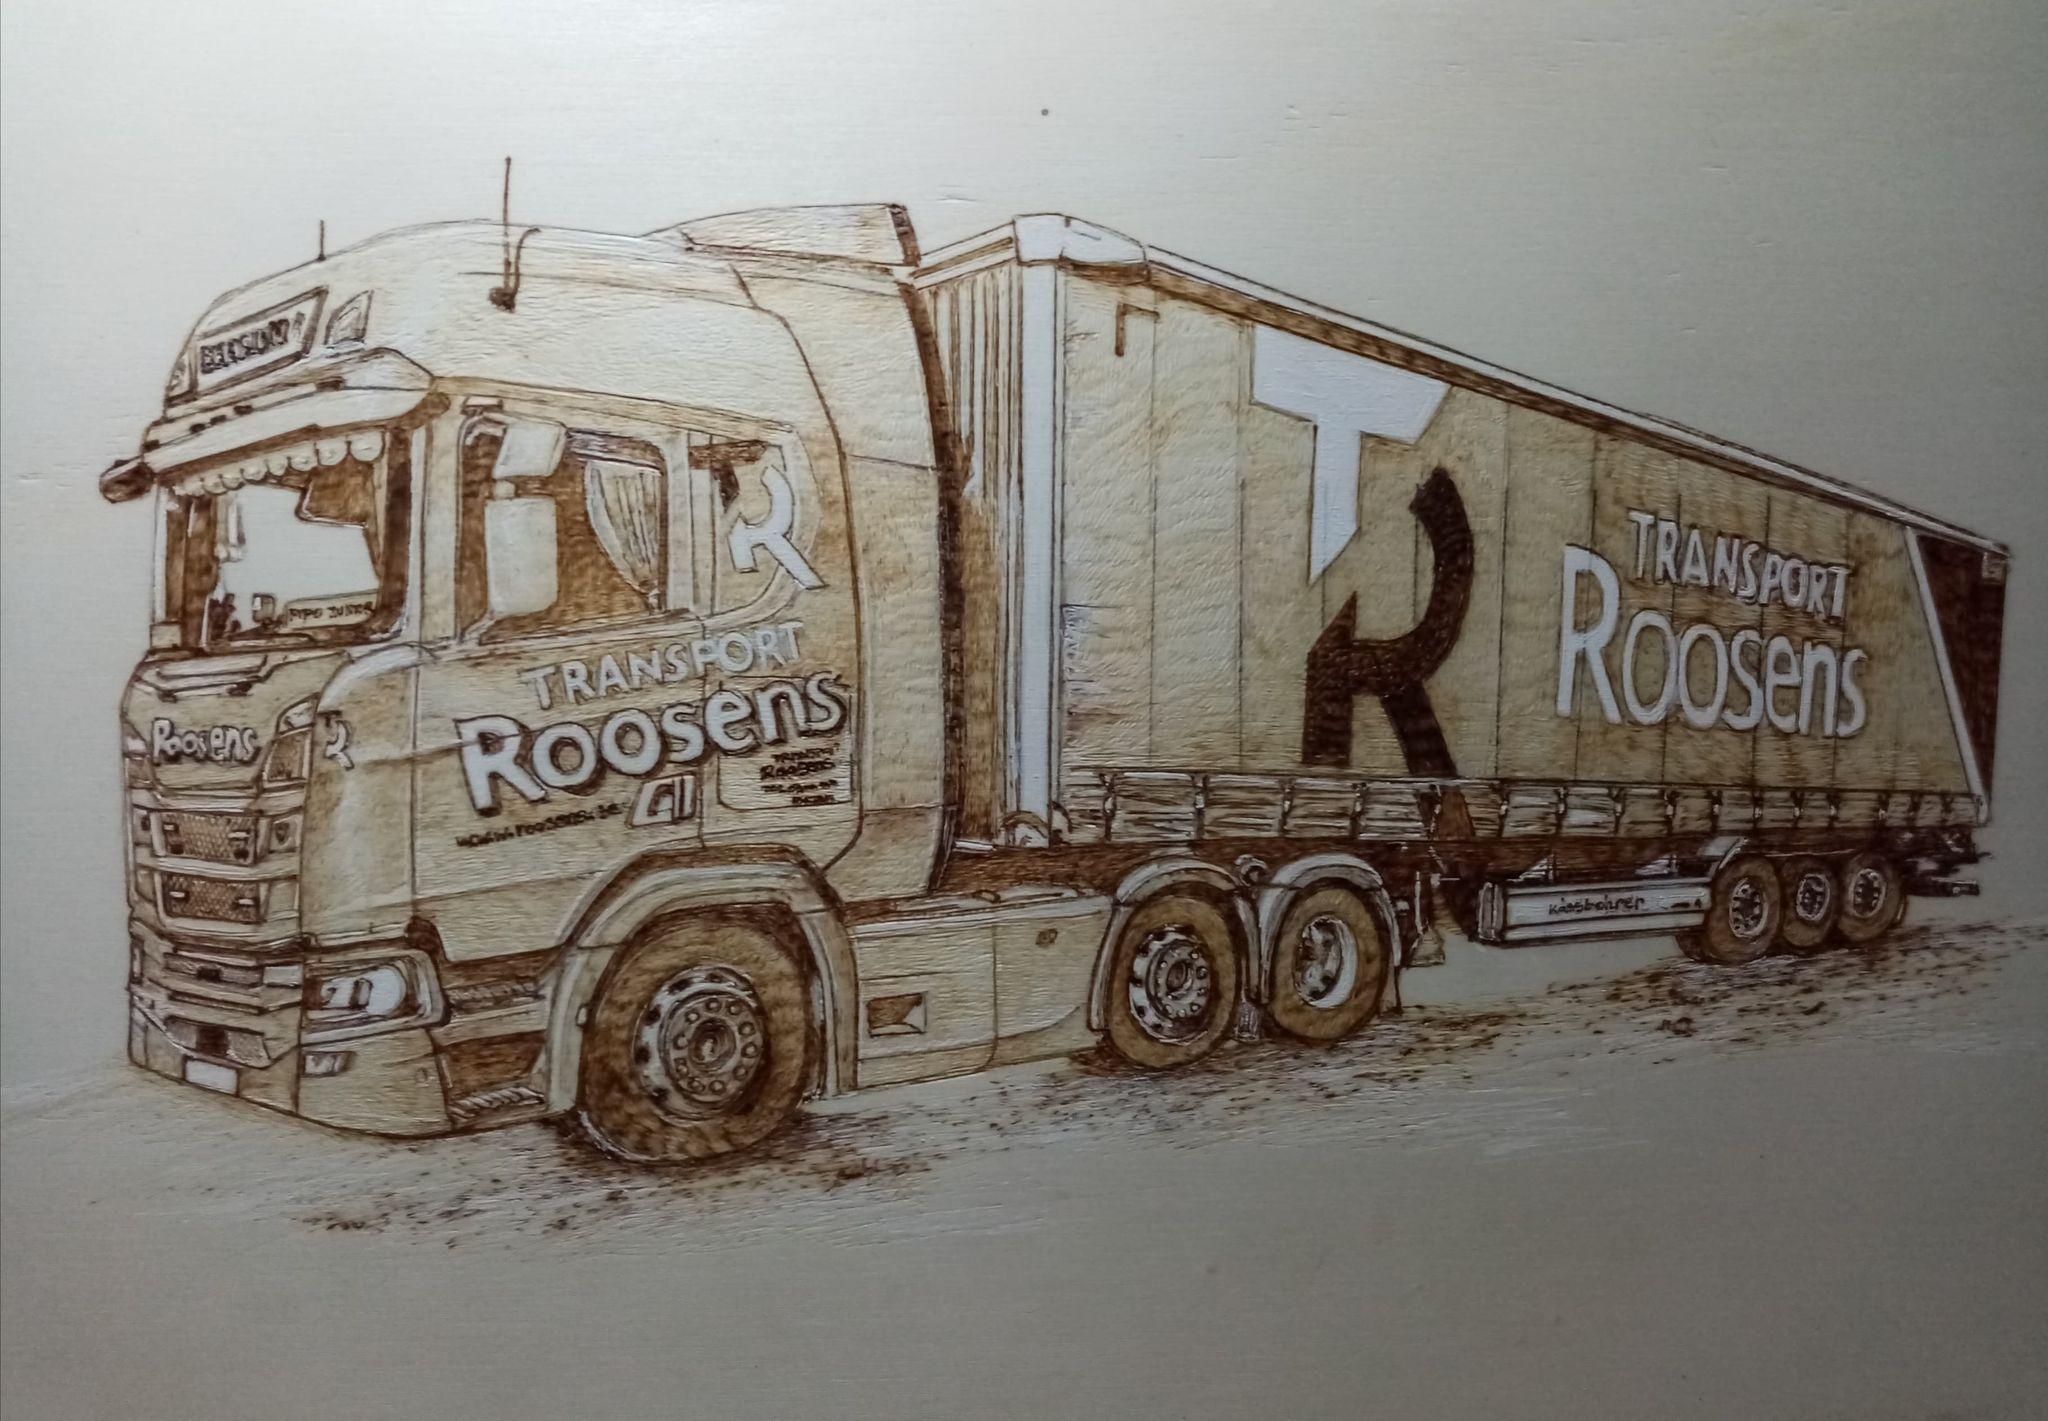 Scania--Roosens--2